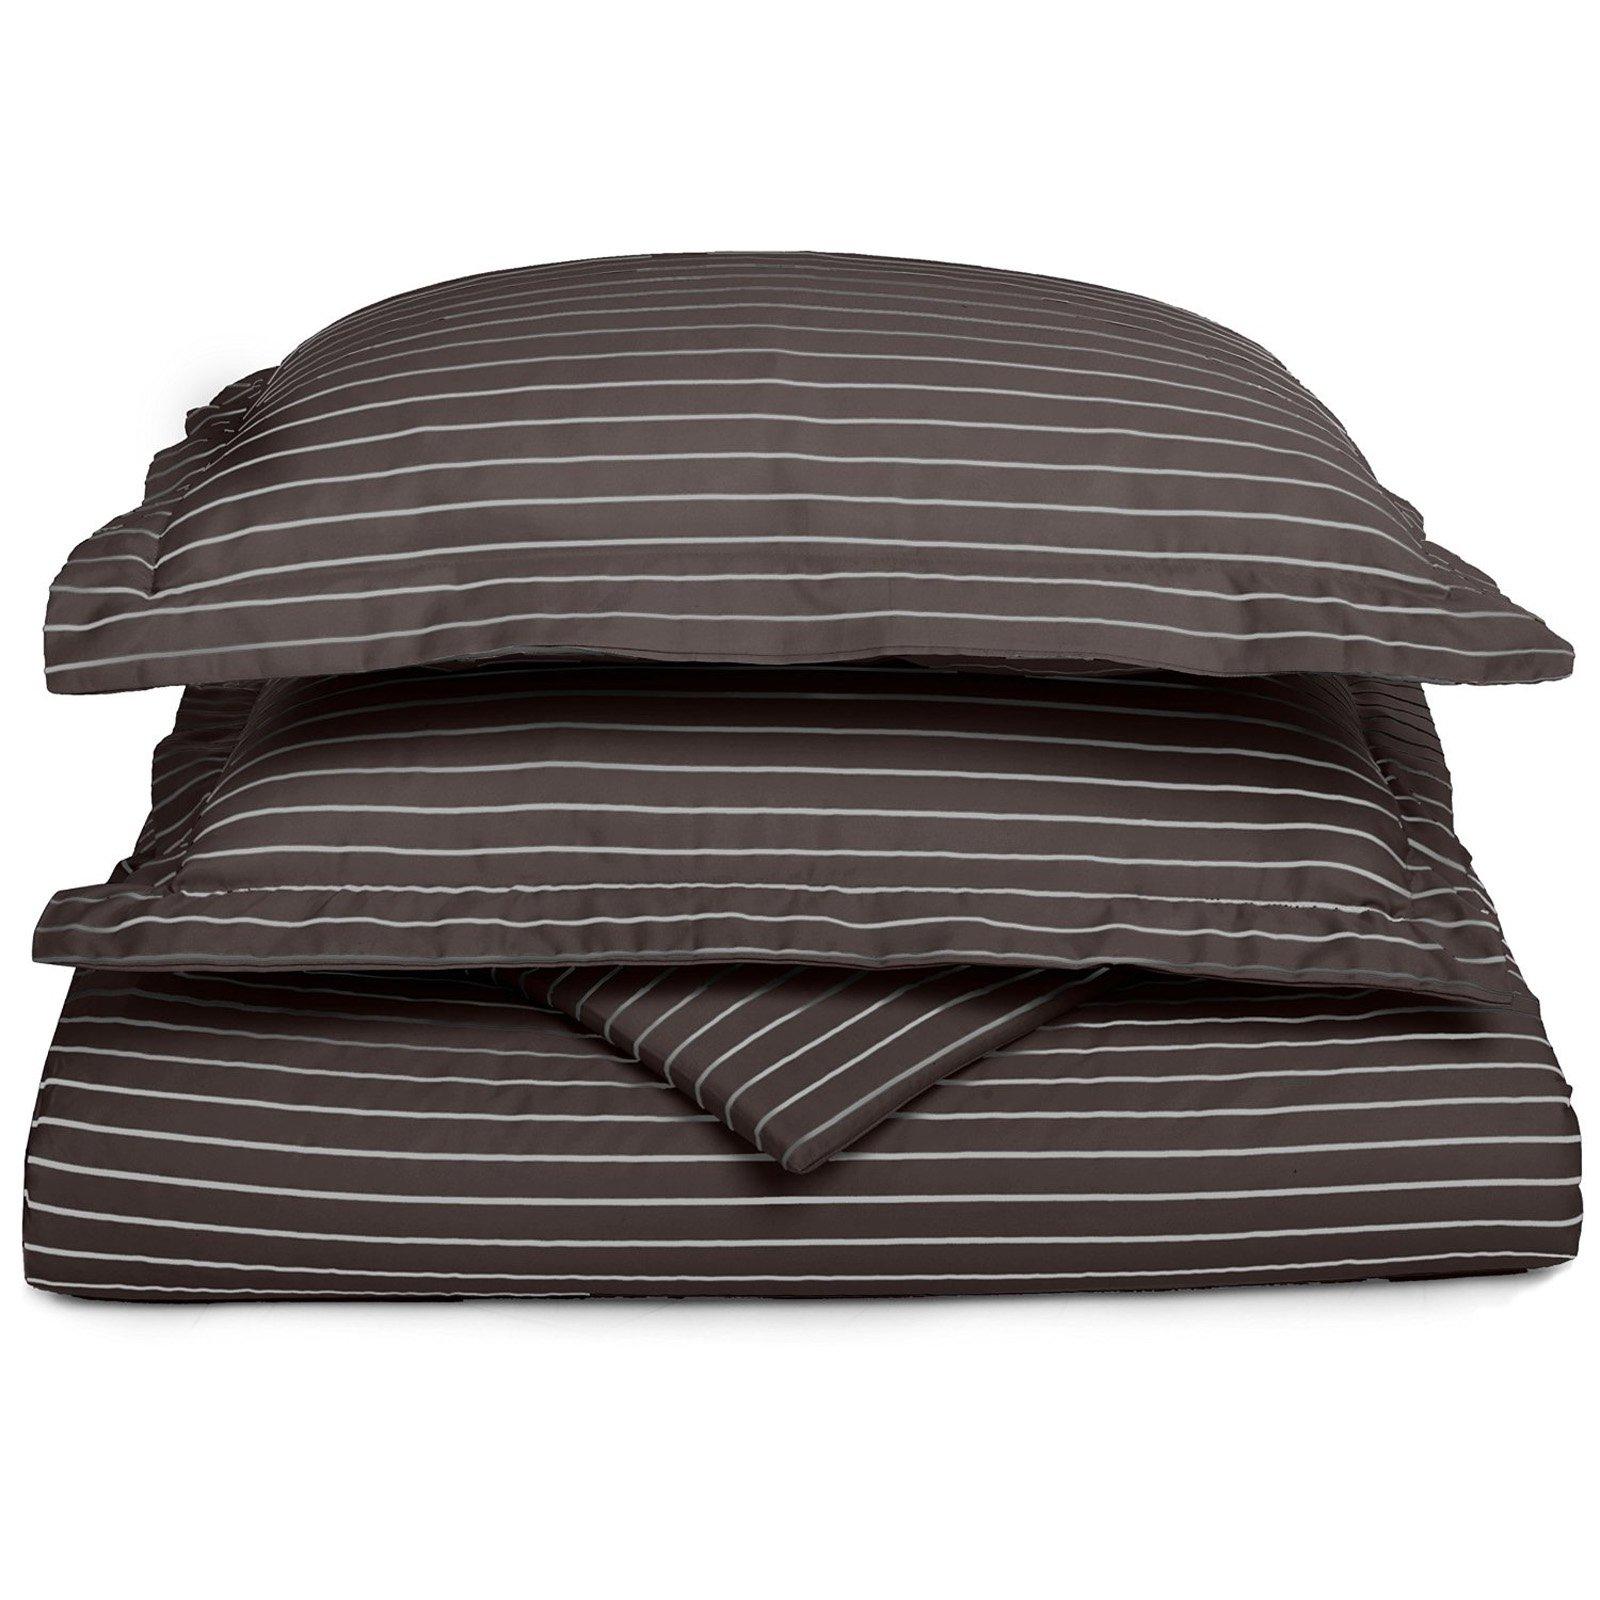 Superior 600 Thread Count Cotton Blend Bahama Stripe Duvet Cover Set